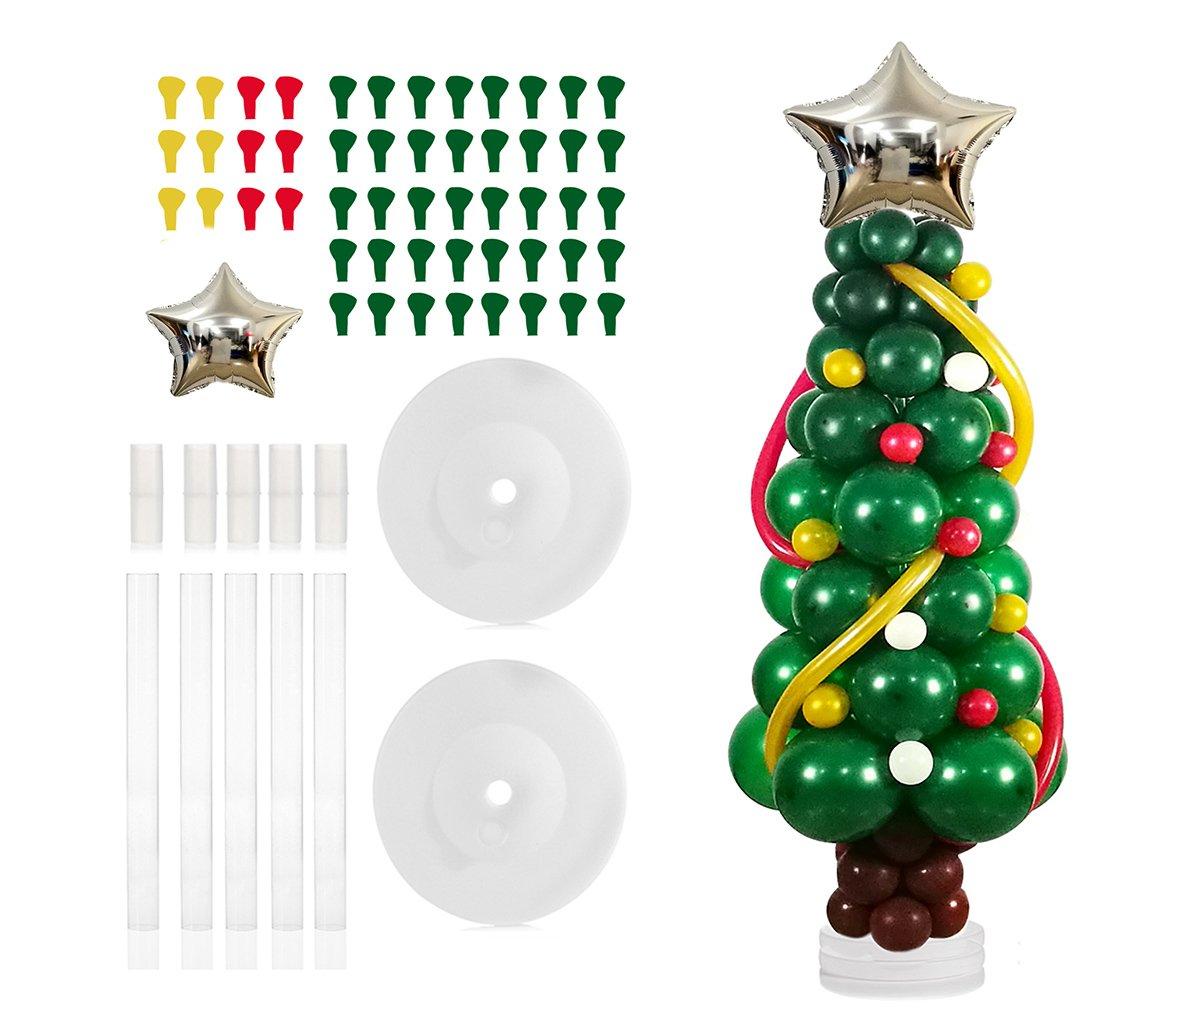 Amazon.com: Balloon Christmas Tree Balloon Column Stand Base and ...